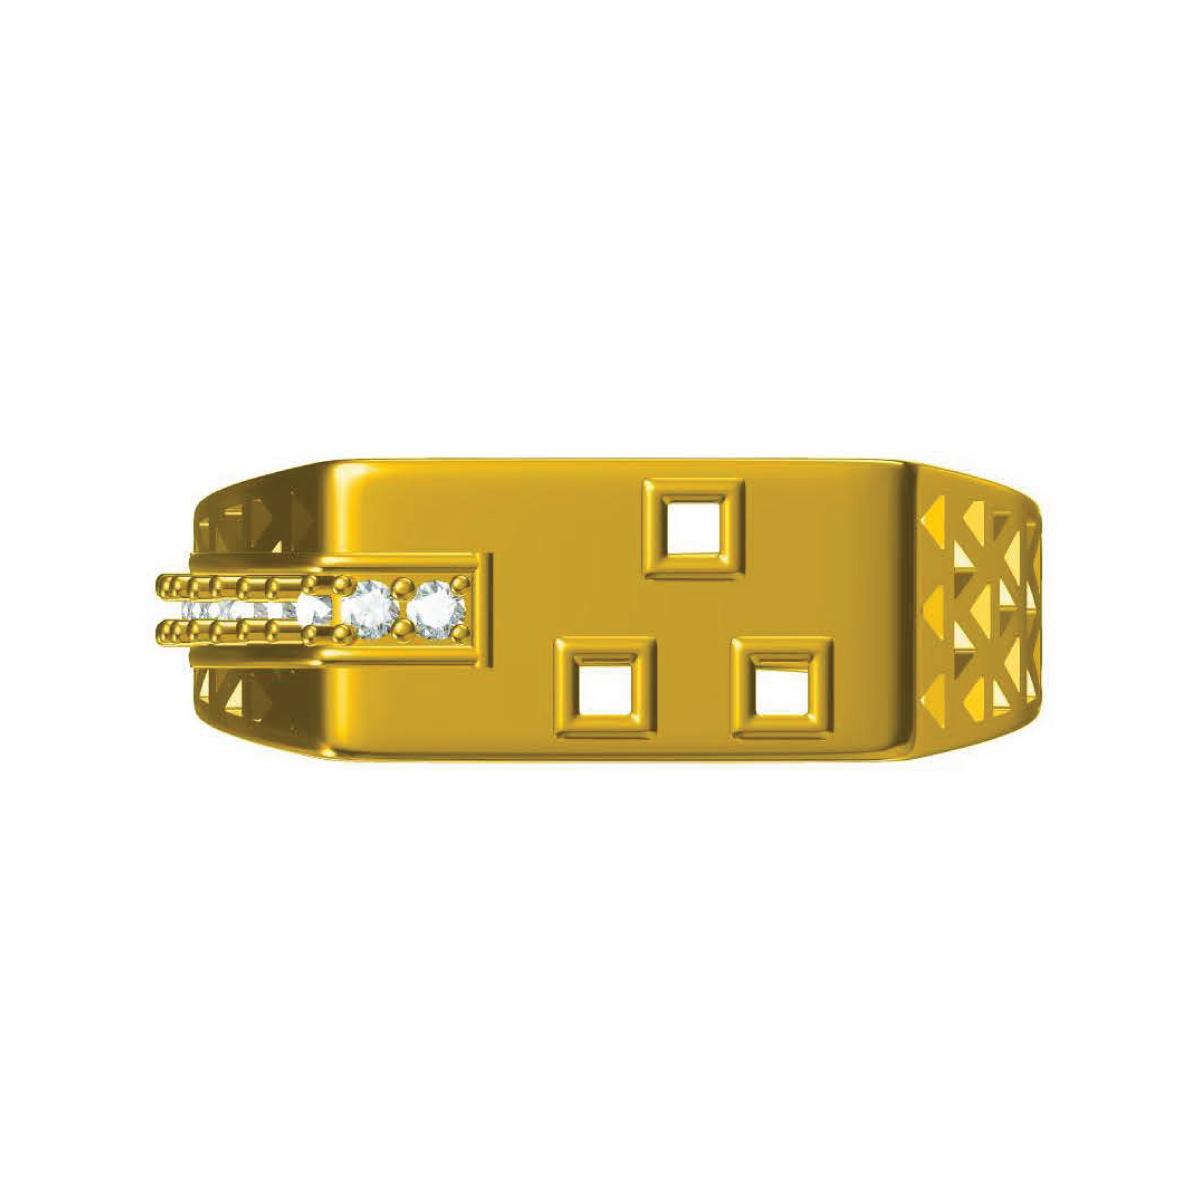 3 Star Gold Ring